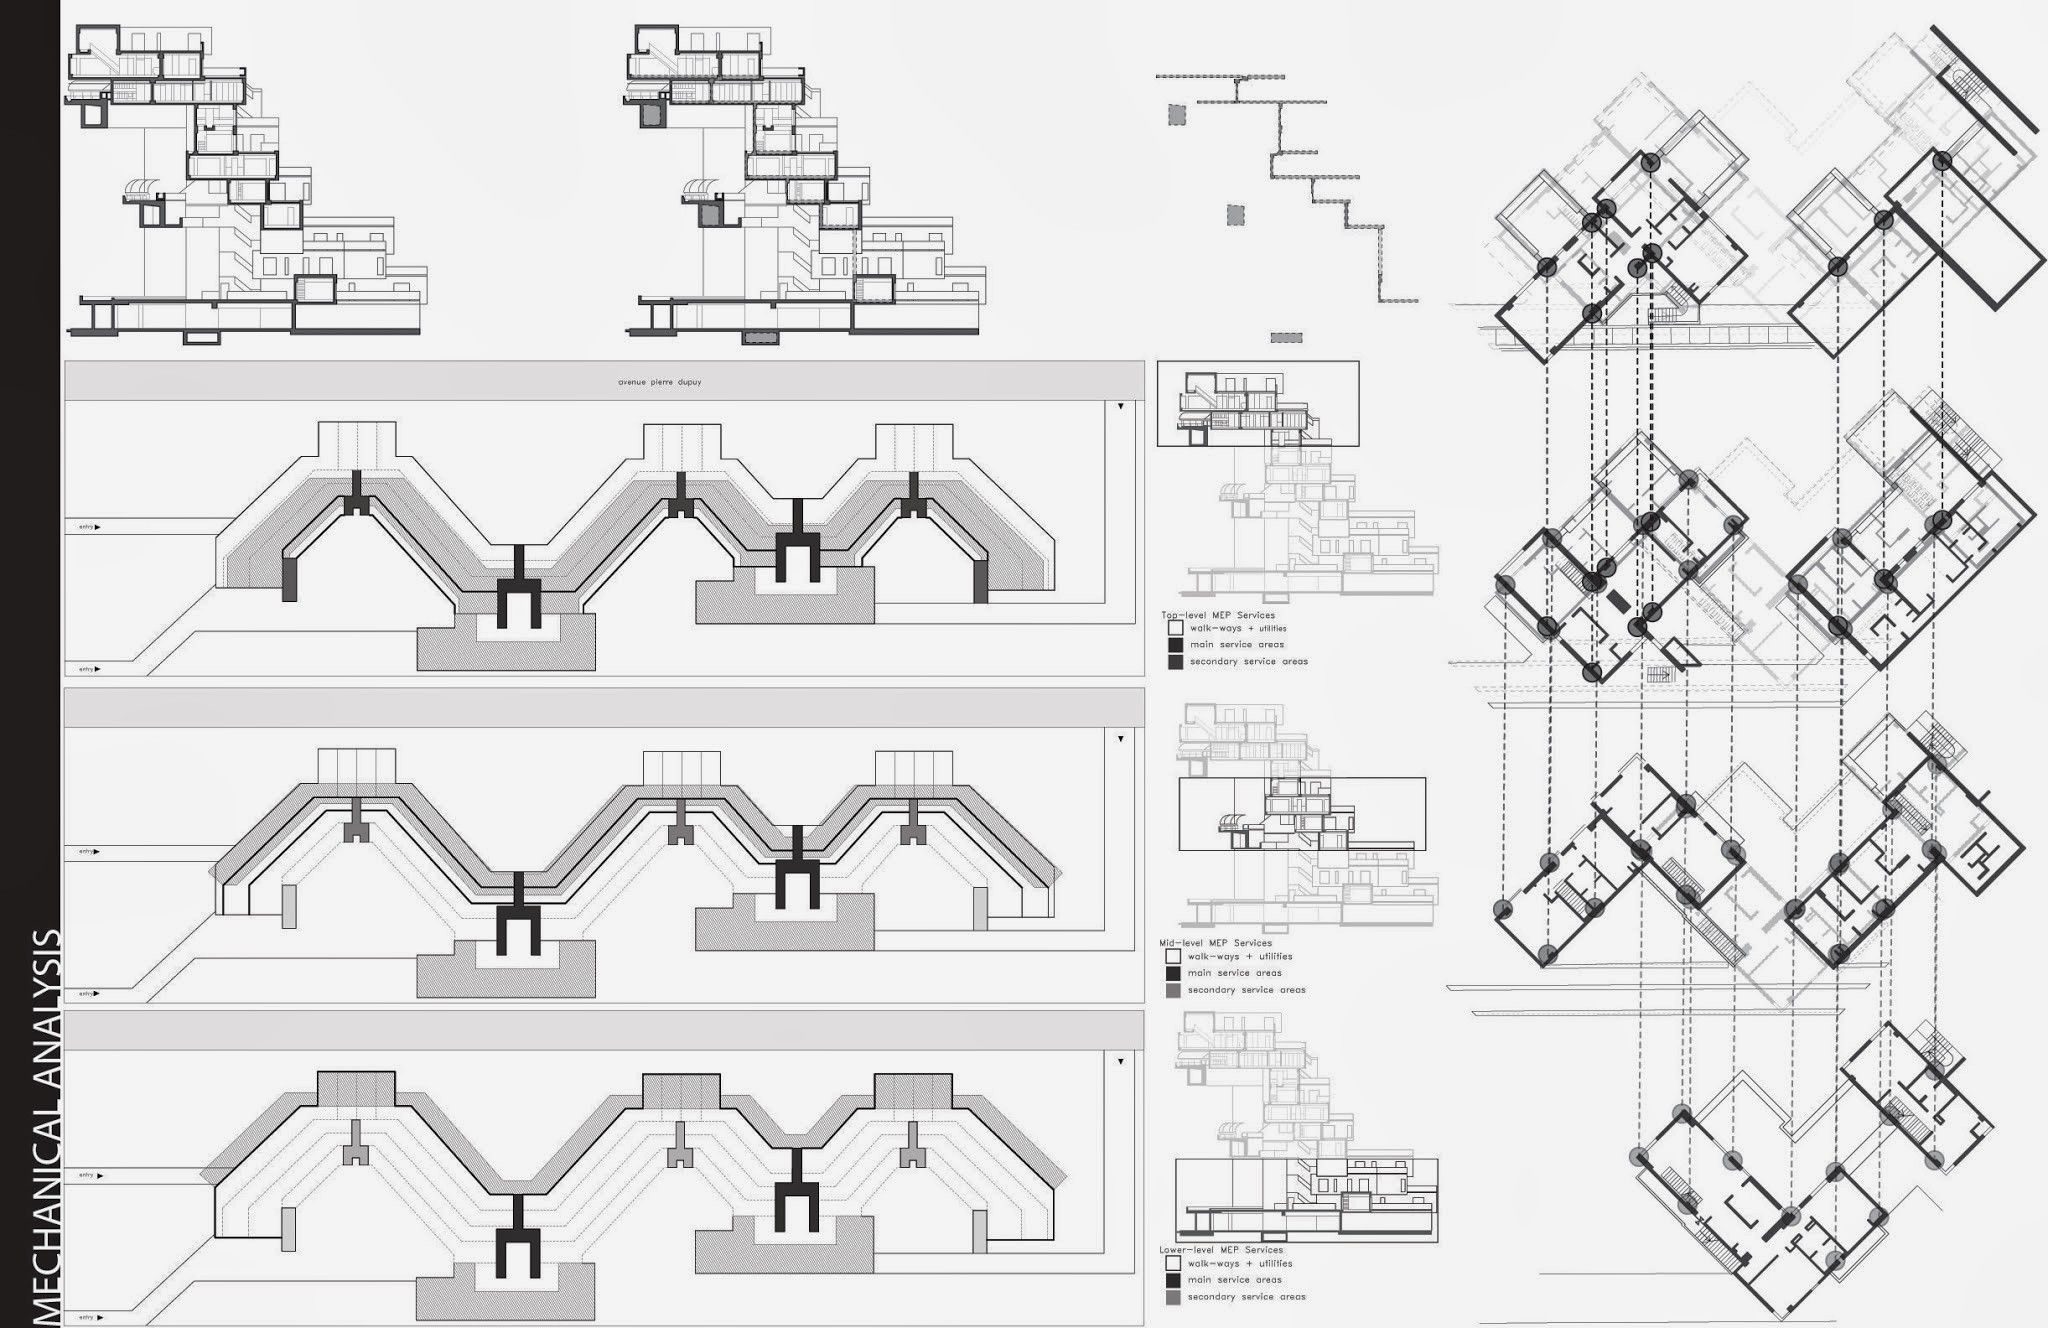 Especiesdeespaciosenconstruccion Habitat 67 Moshe Safdie Diagramas De Arquitectura Habitat Arquitectura